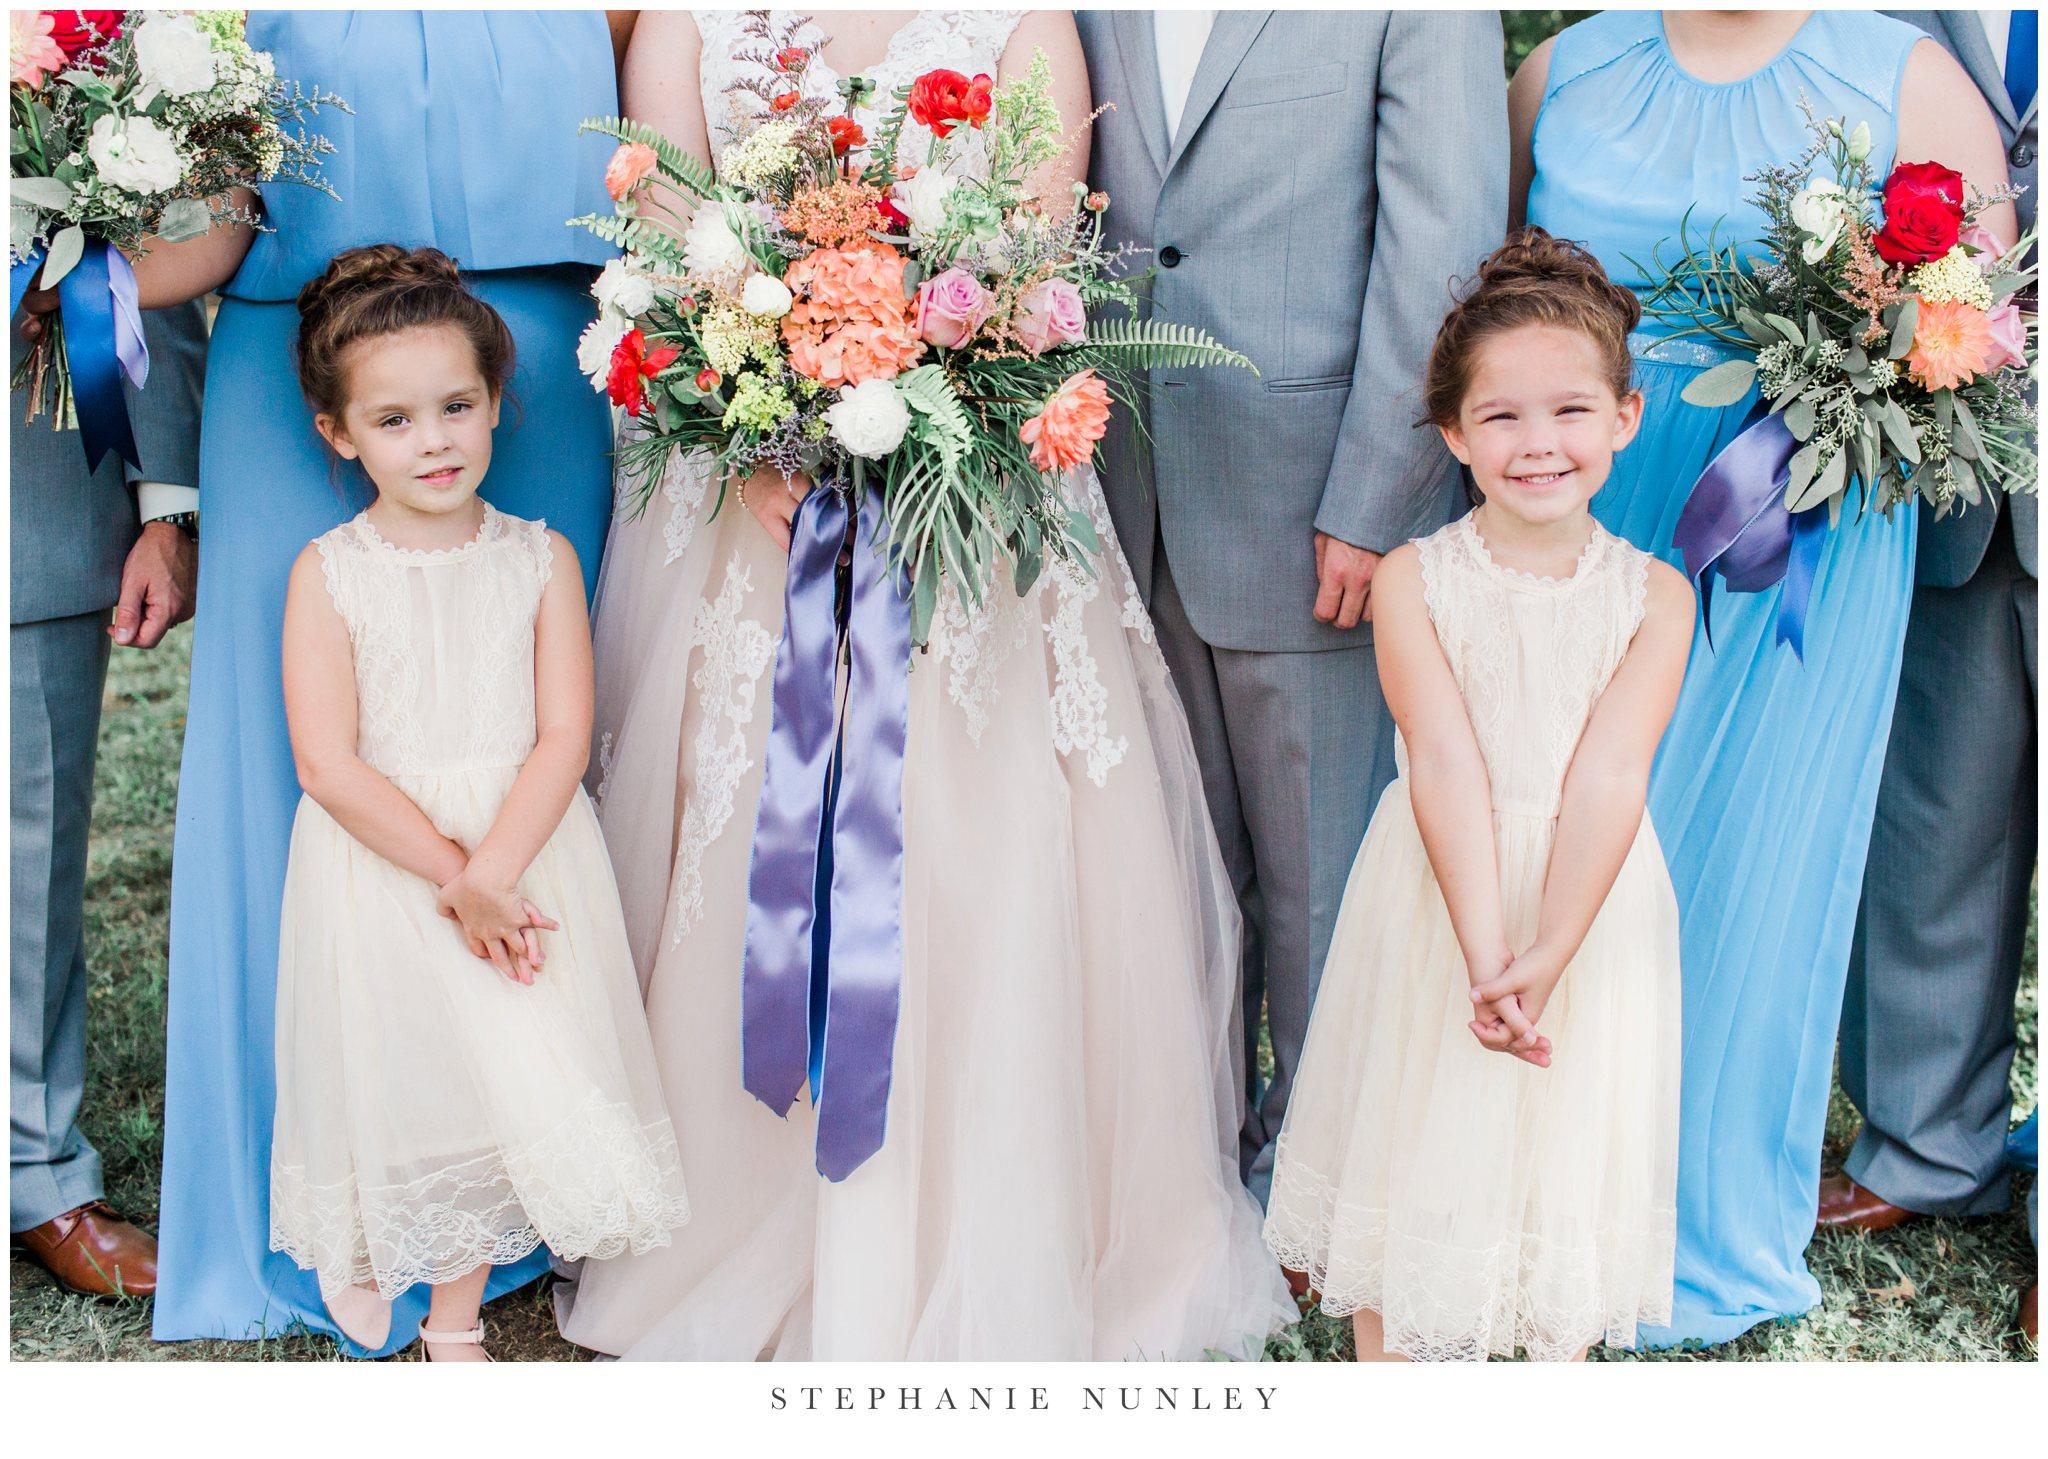 arkansas-wedding-with-lush-wildflower-bouquet-0075.jpg